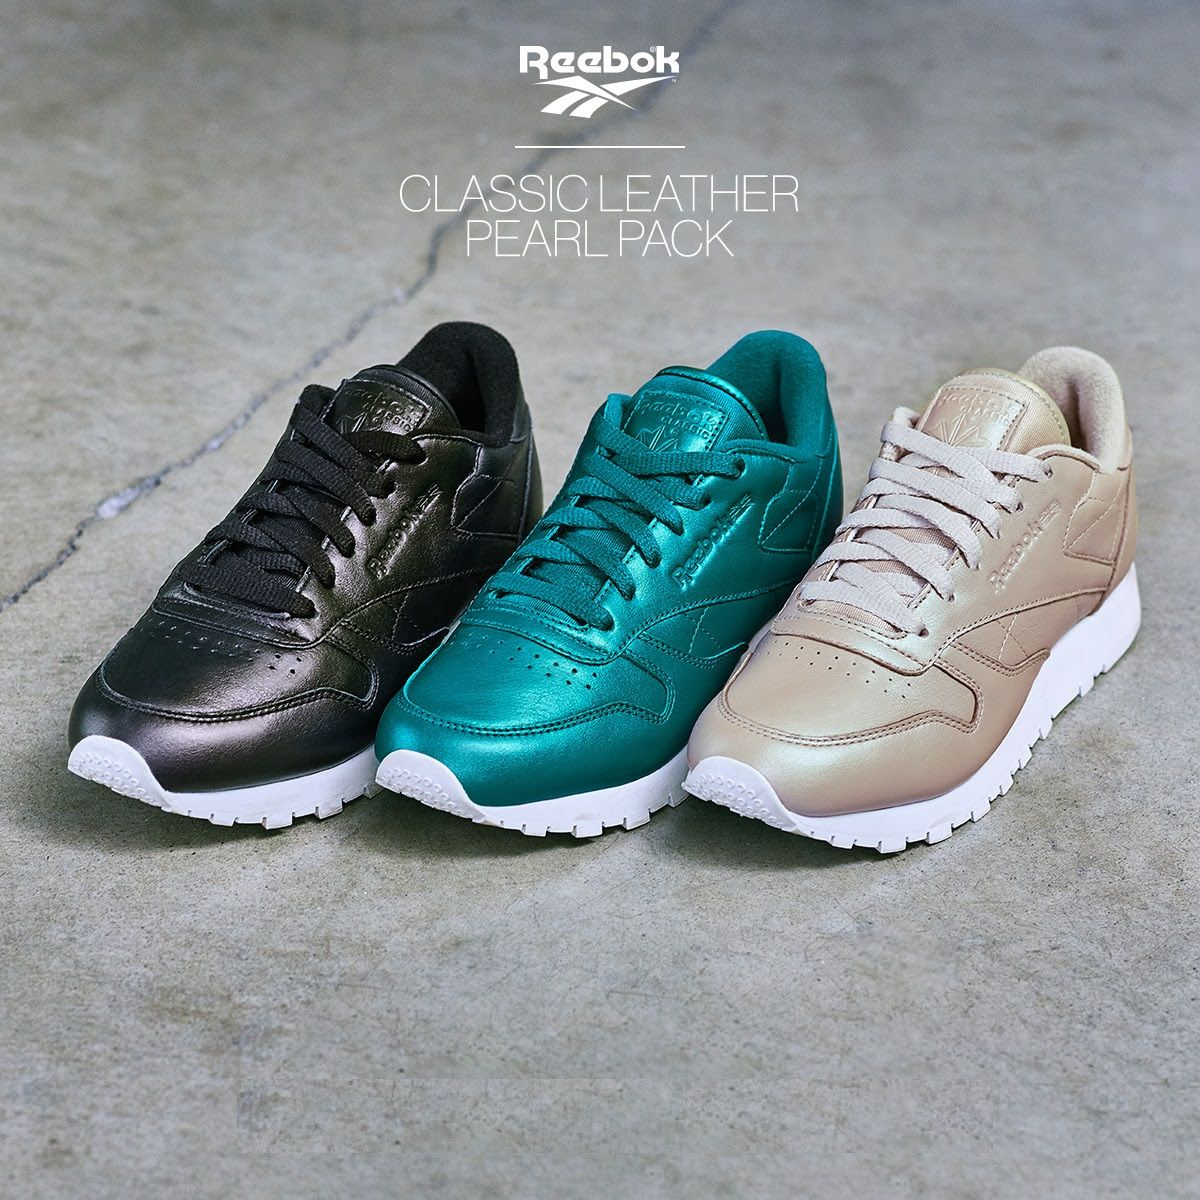 Reebok Classic Leather Club C Metallic Gold Pack Sneaker